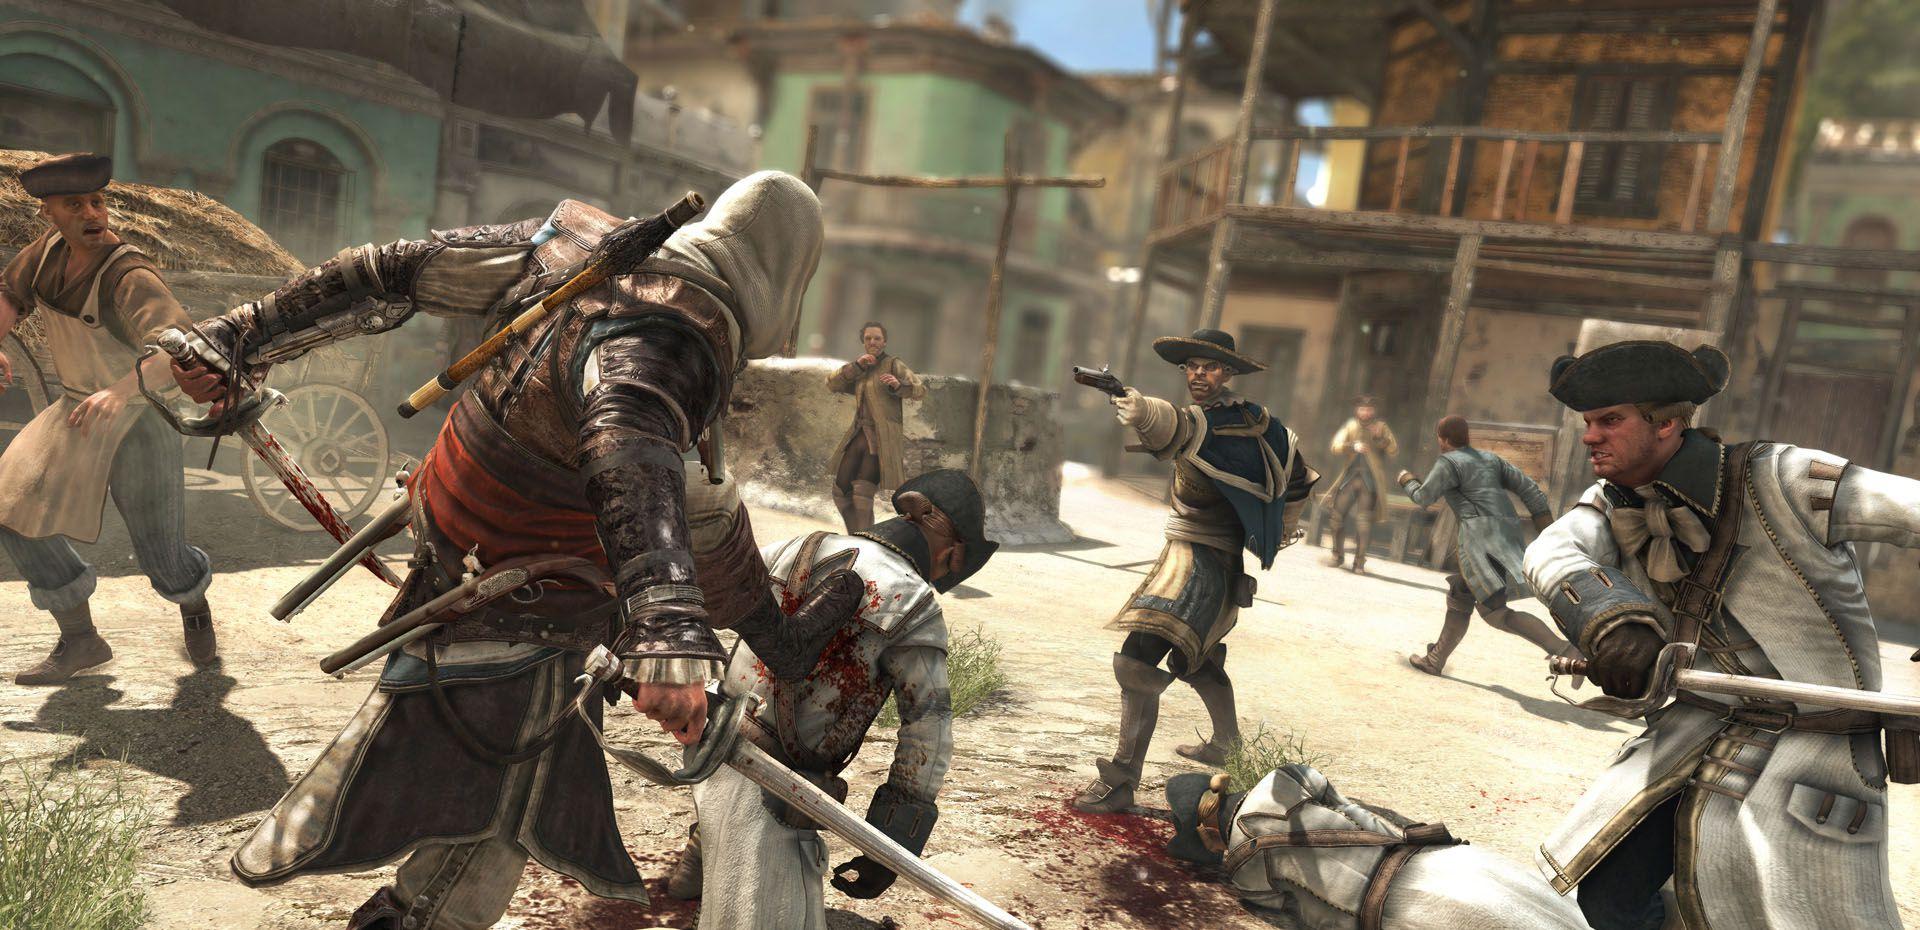 1a33b702a Review: Assassin's Creed IV: Black Flag - Slant Magazine